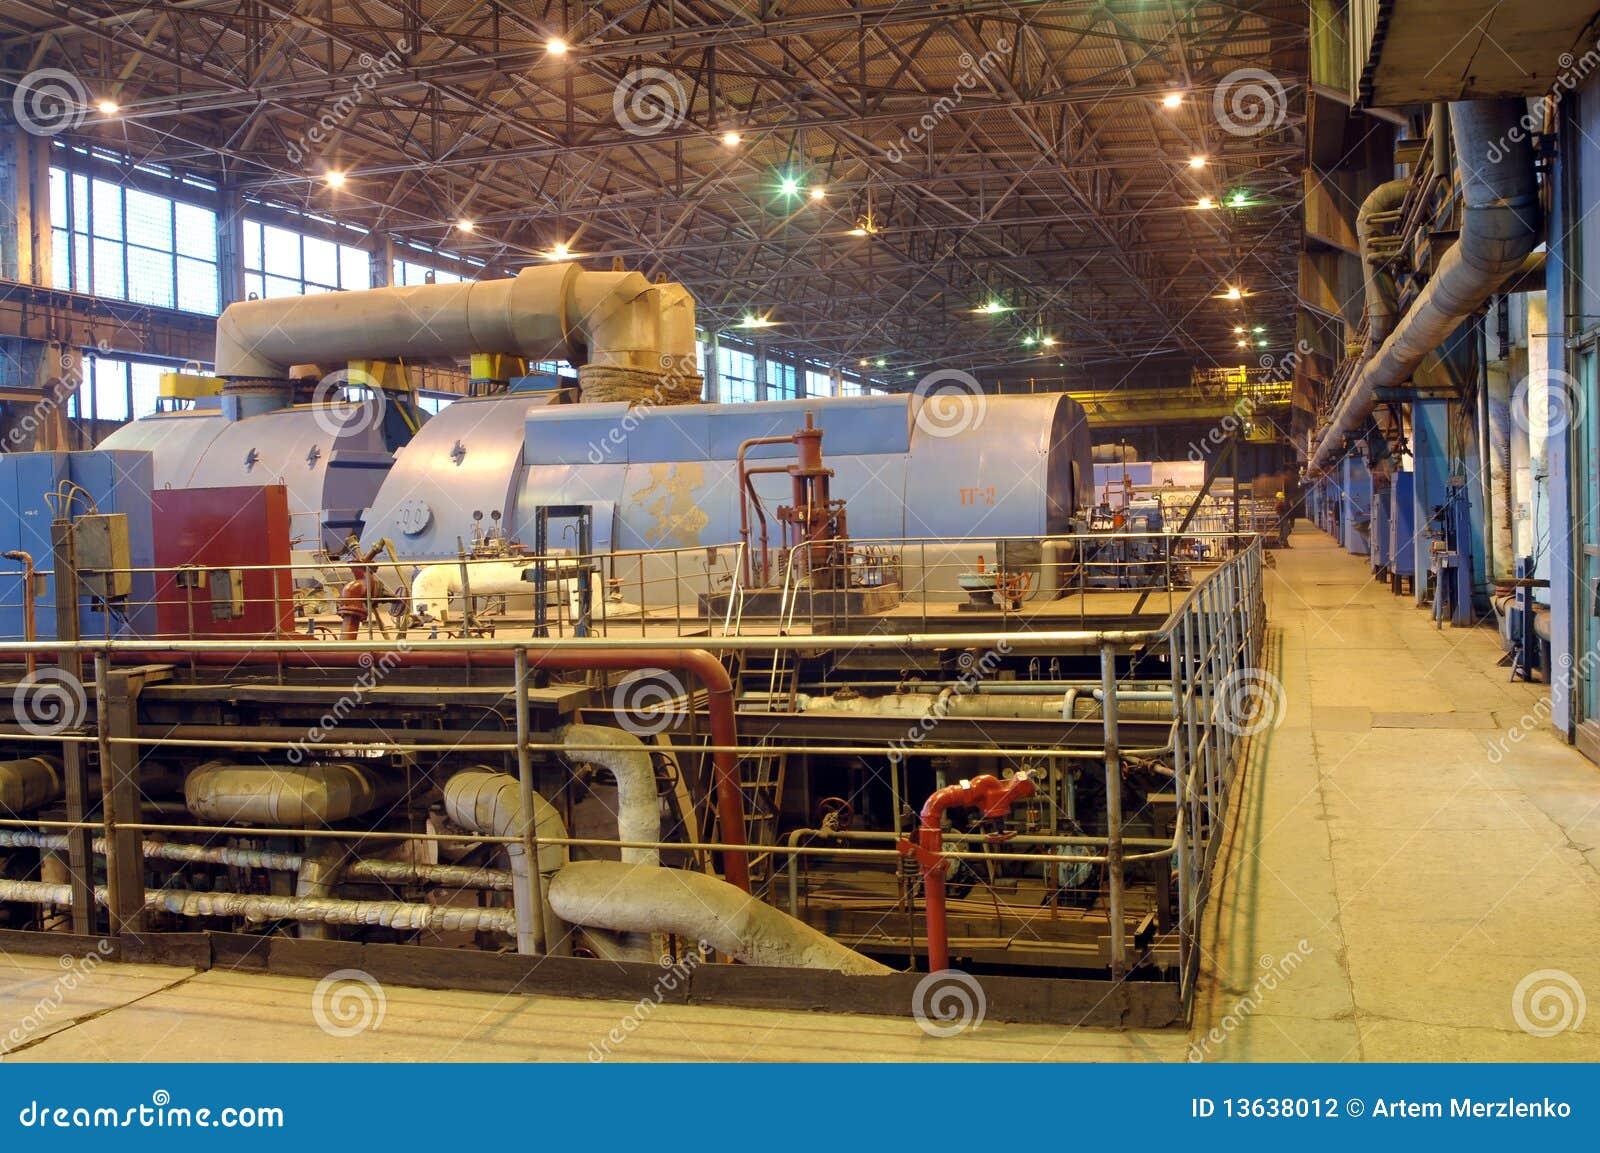 Industry Installations power